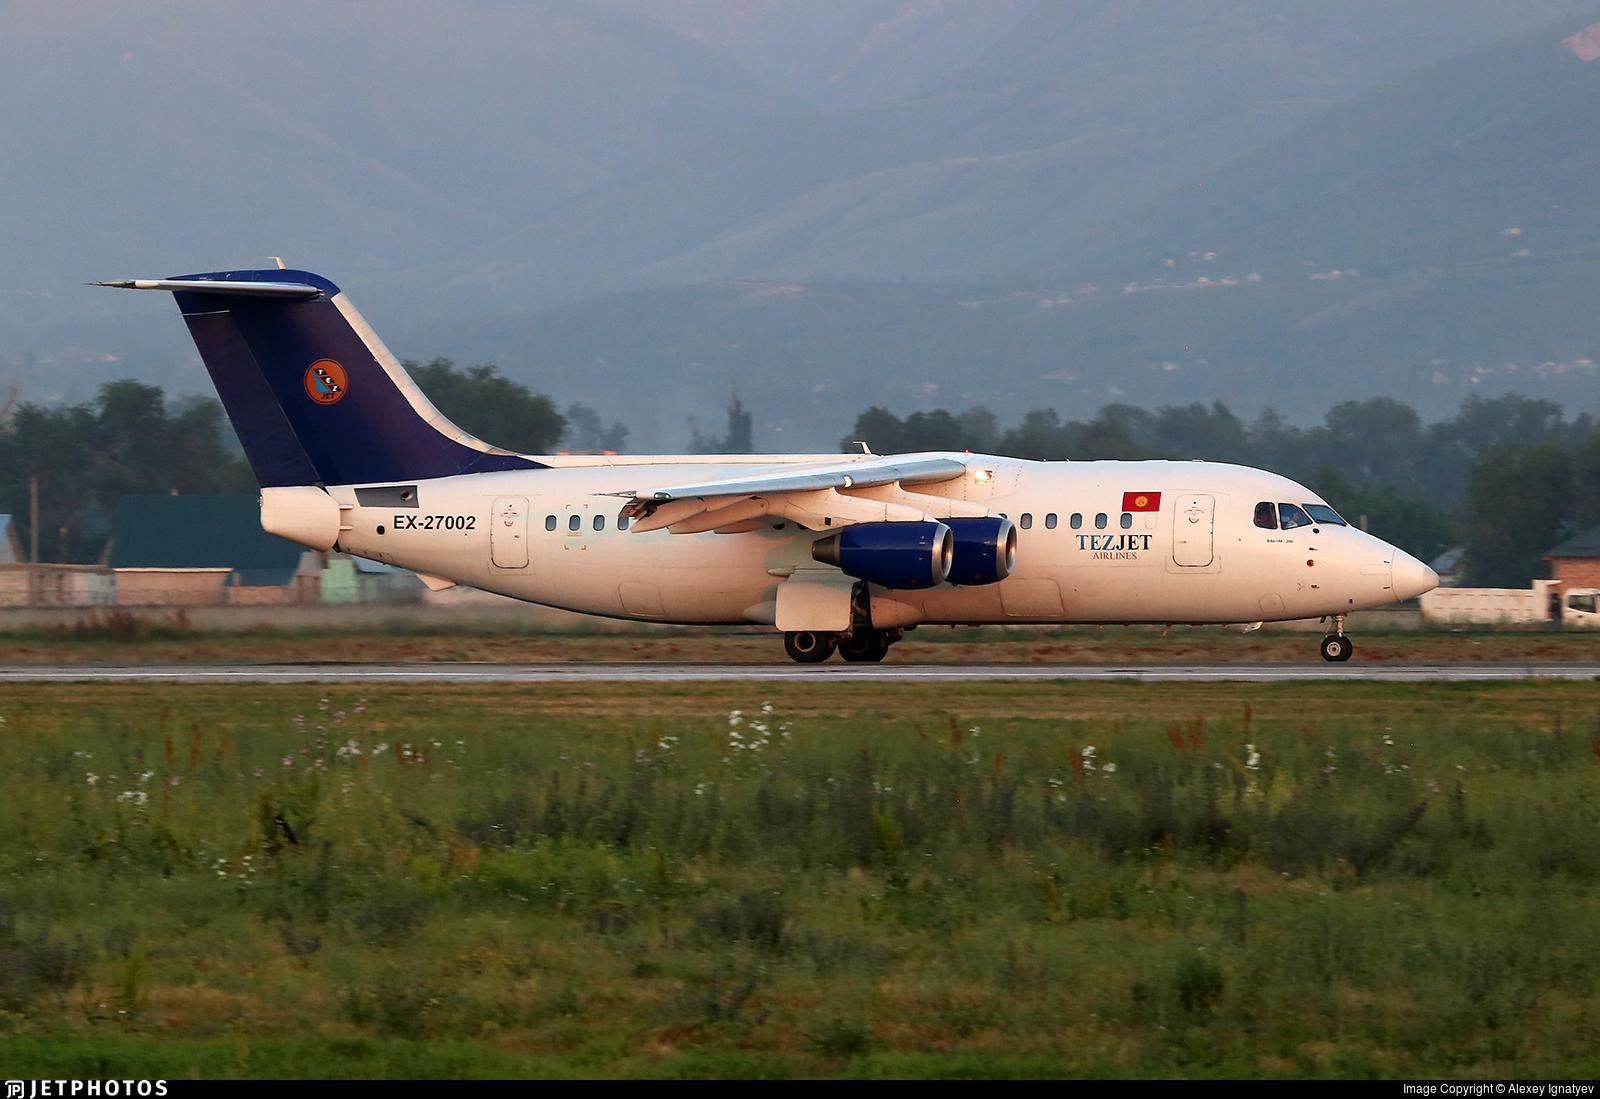 EX-27002 - British Aerospace BAe 146-200 - TezJet Air Company